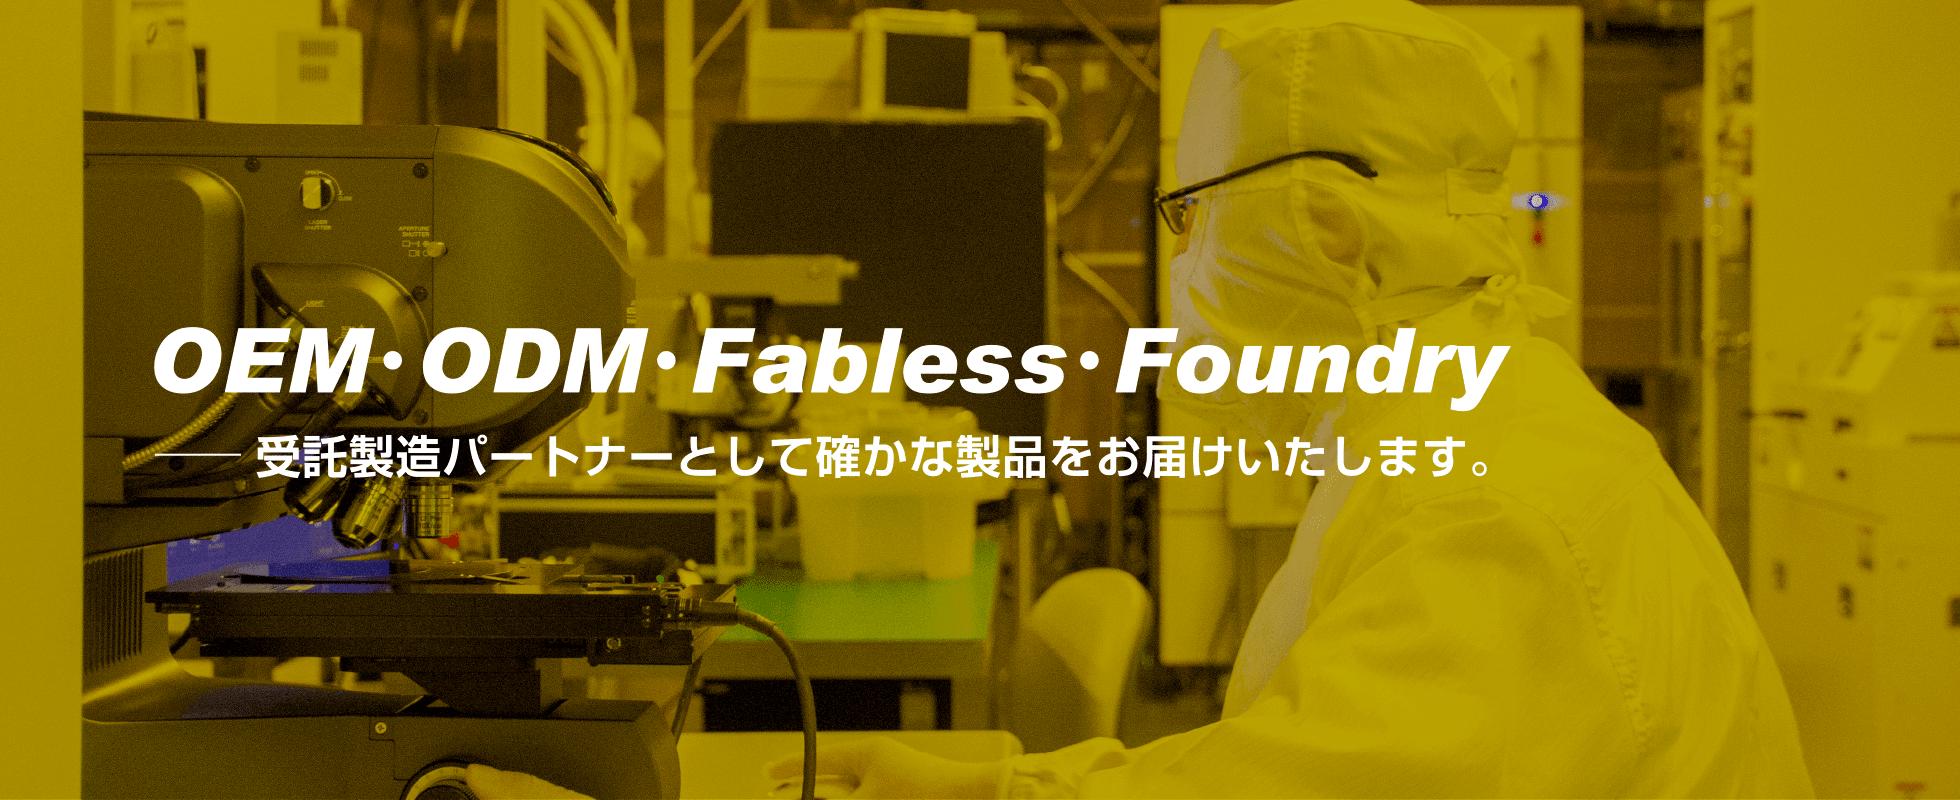 ODM、OEMでの受託製造パートナーとして確かな製品をお届けいたします